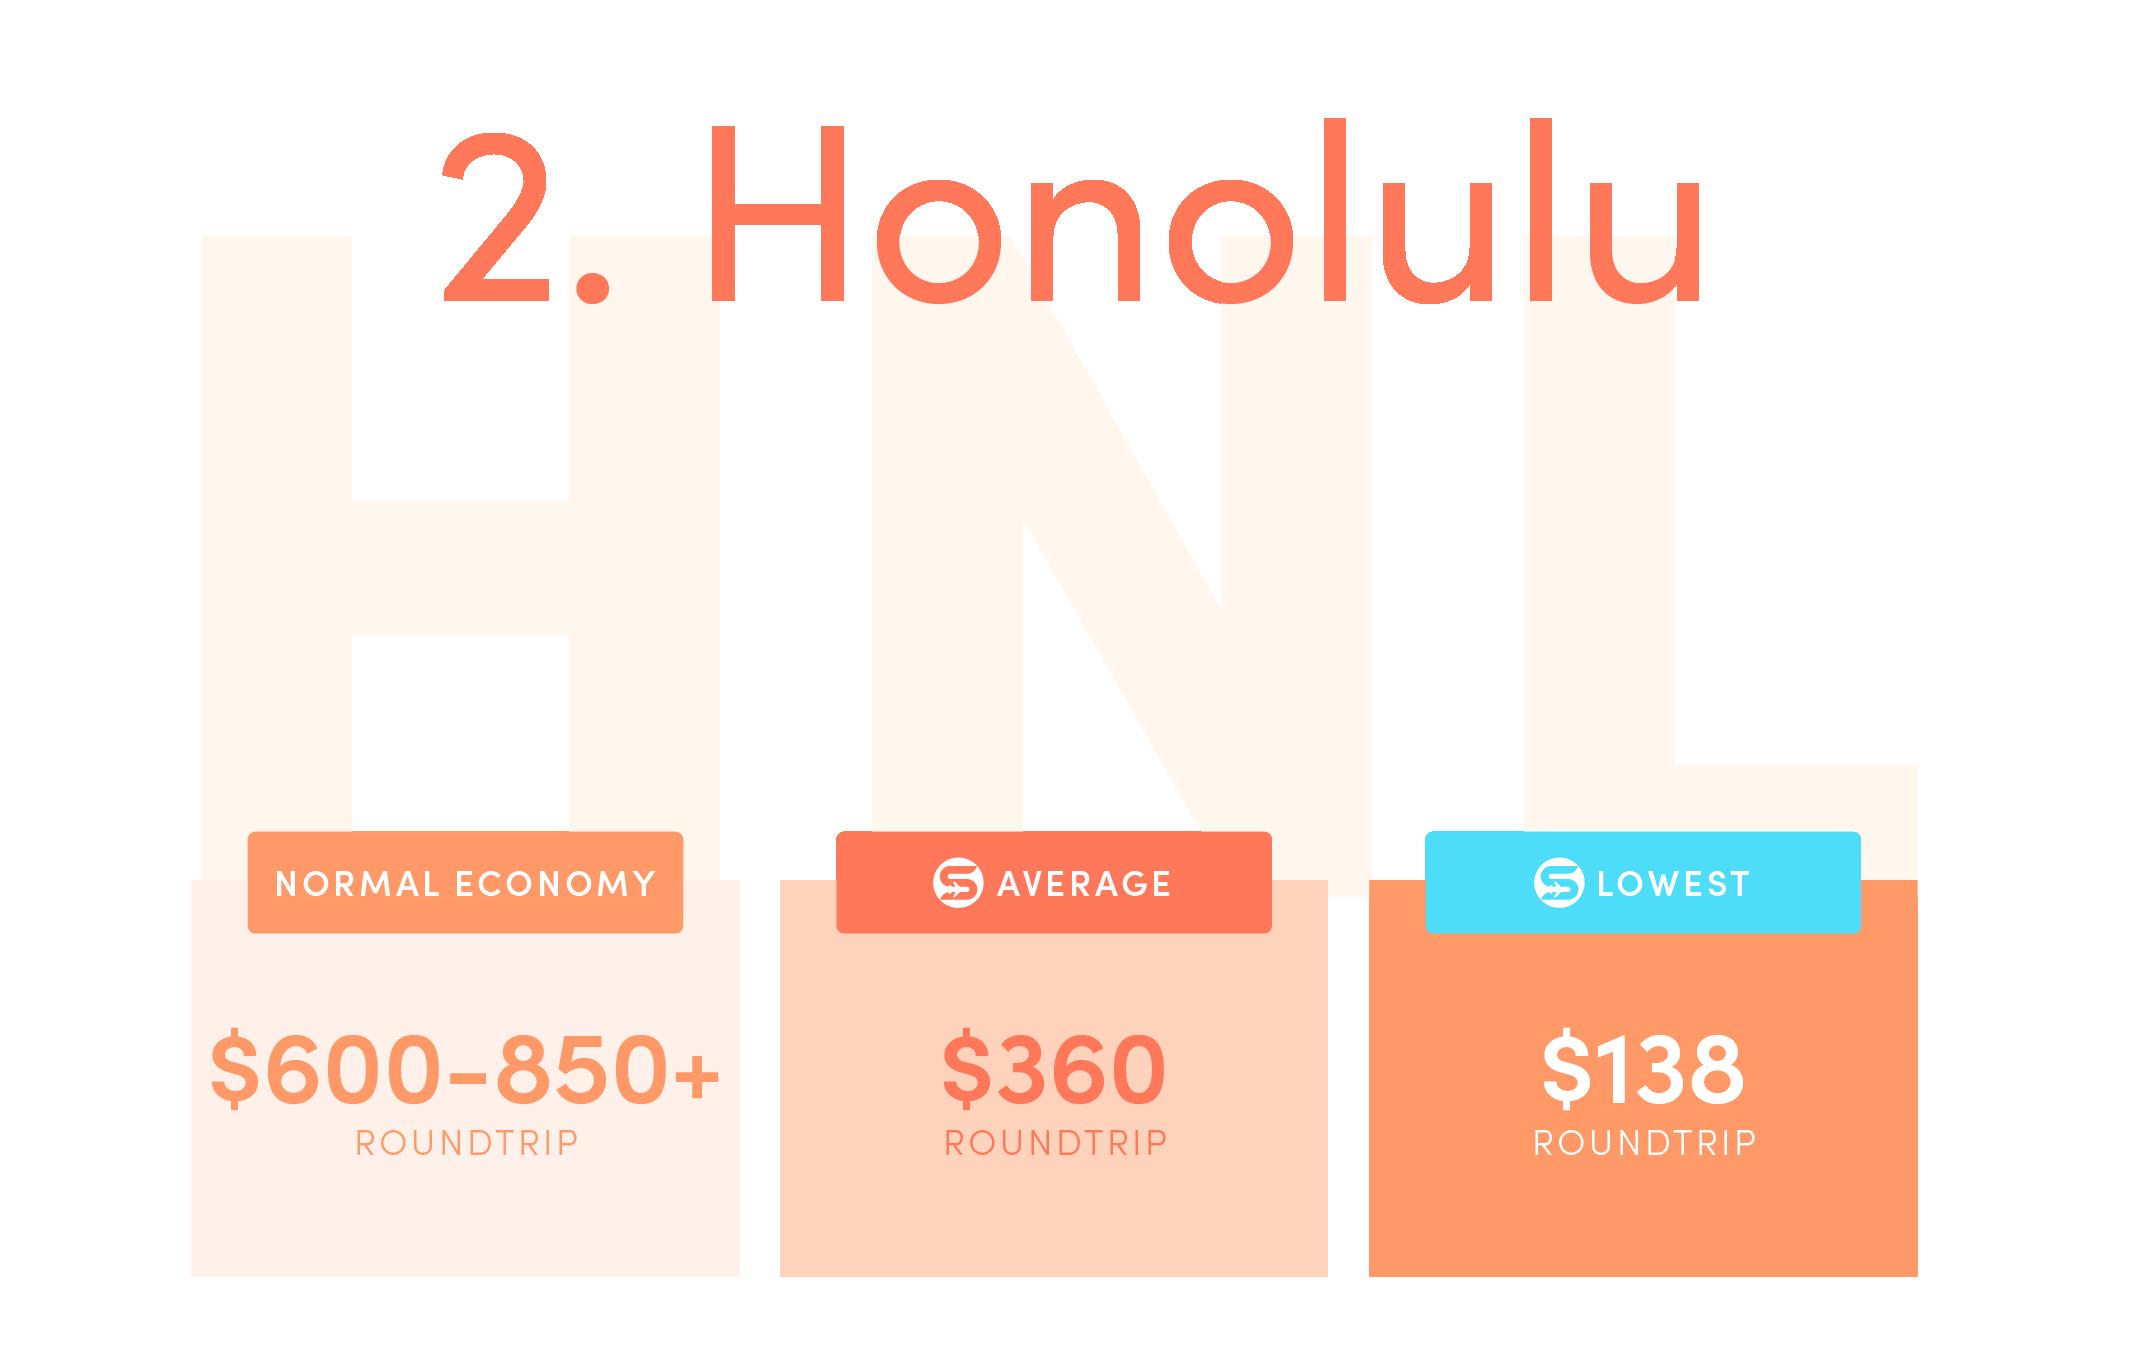 Honolulu (HNL).Normal economy price from the US: $600-850+ roundtrip.Average Scott's Cheap Flights economy price: $360 roundtrip.Lowest Scott's Cheap Flights price in 2021: $138 roundtrip.